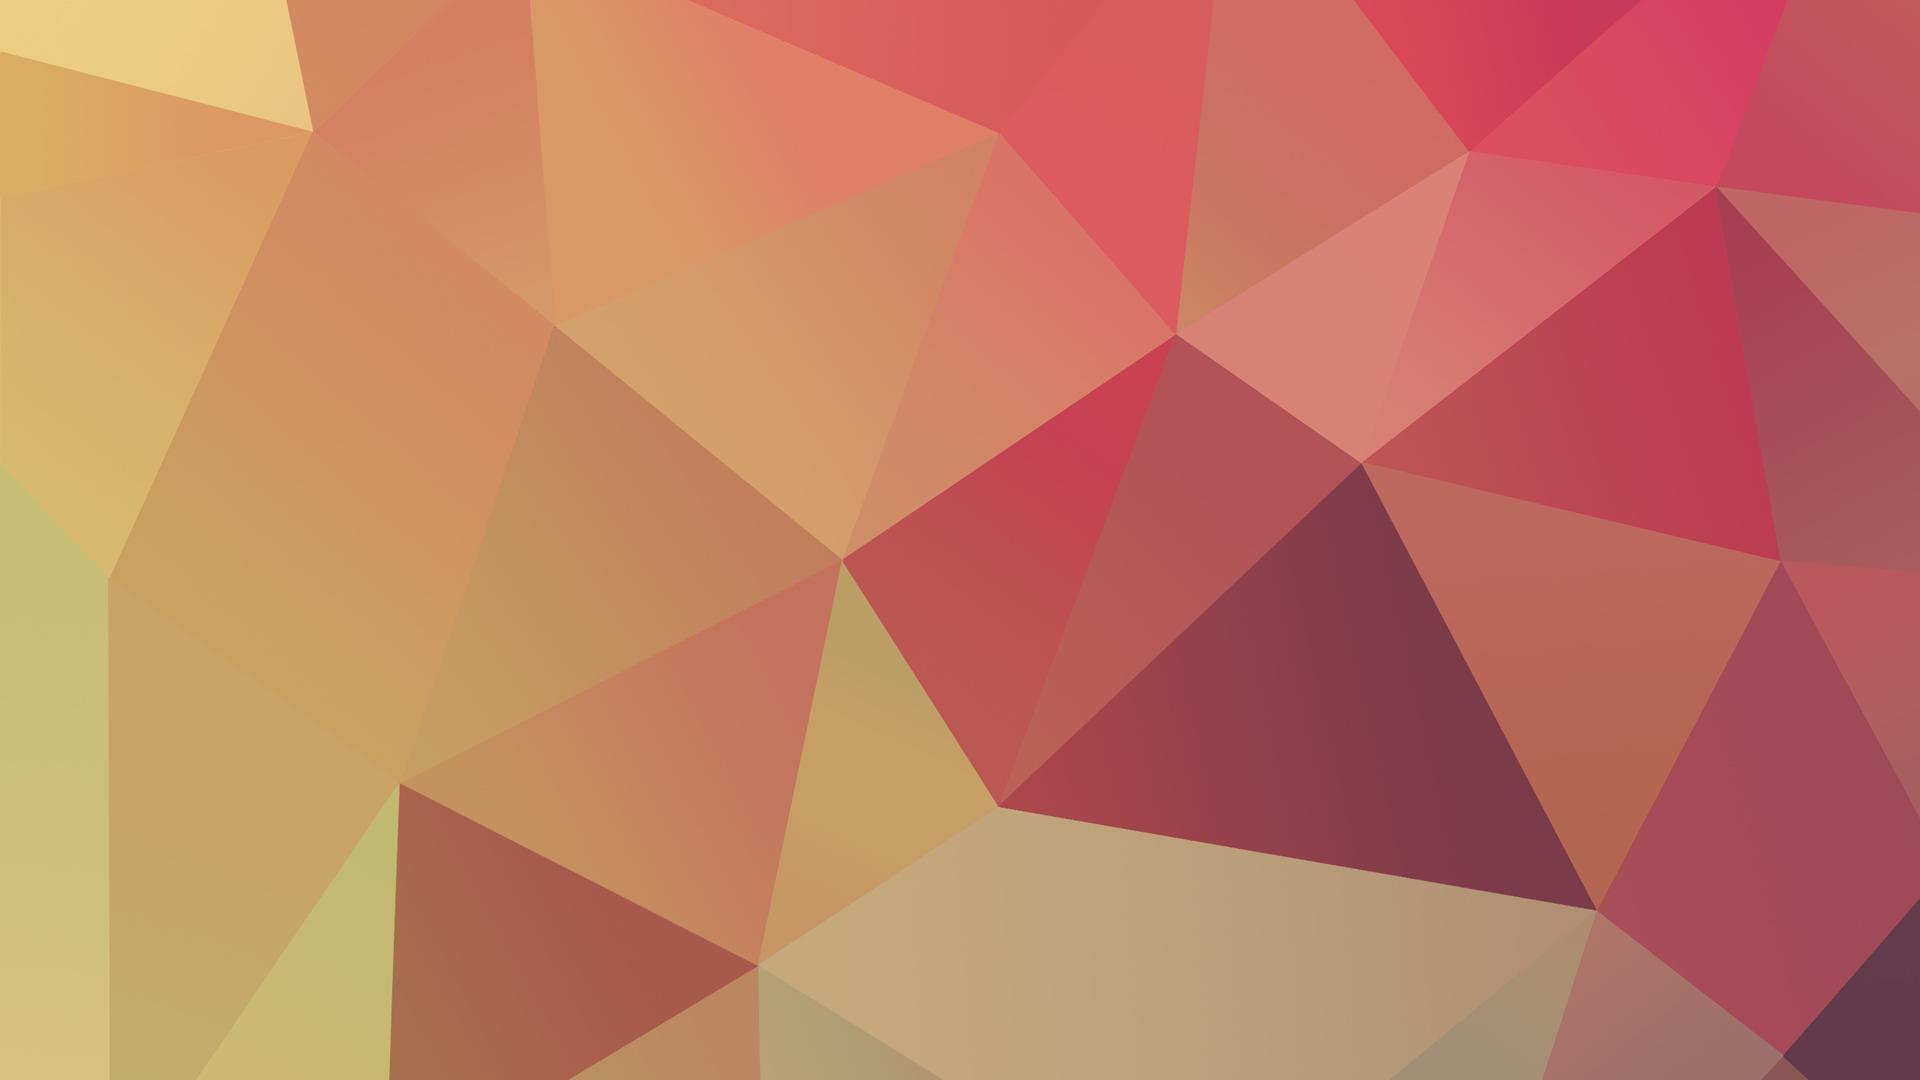 Wallpaper Geometric Color 27 1080p HD by AIRWORLDKING on DeviantArt